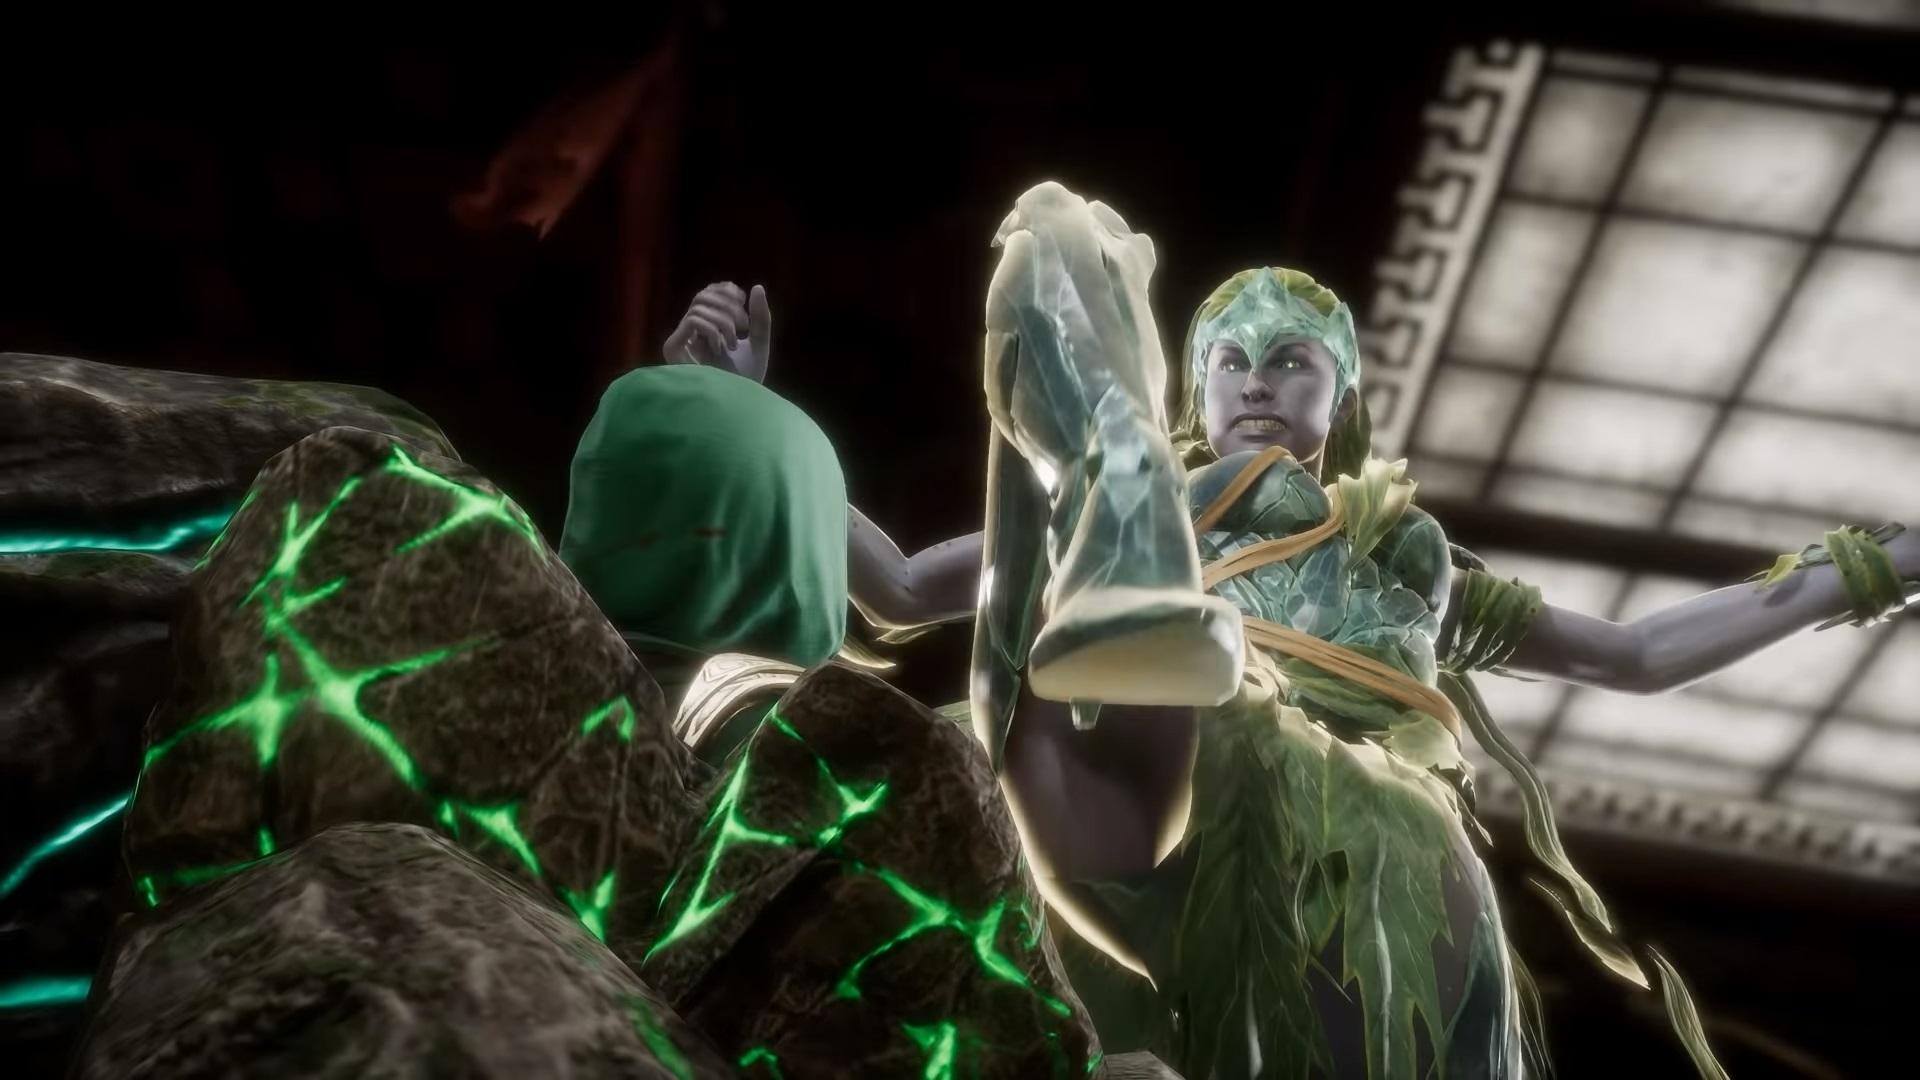 Mortal Kombat 11 Cetrion Fatalities